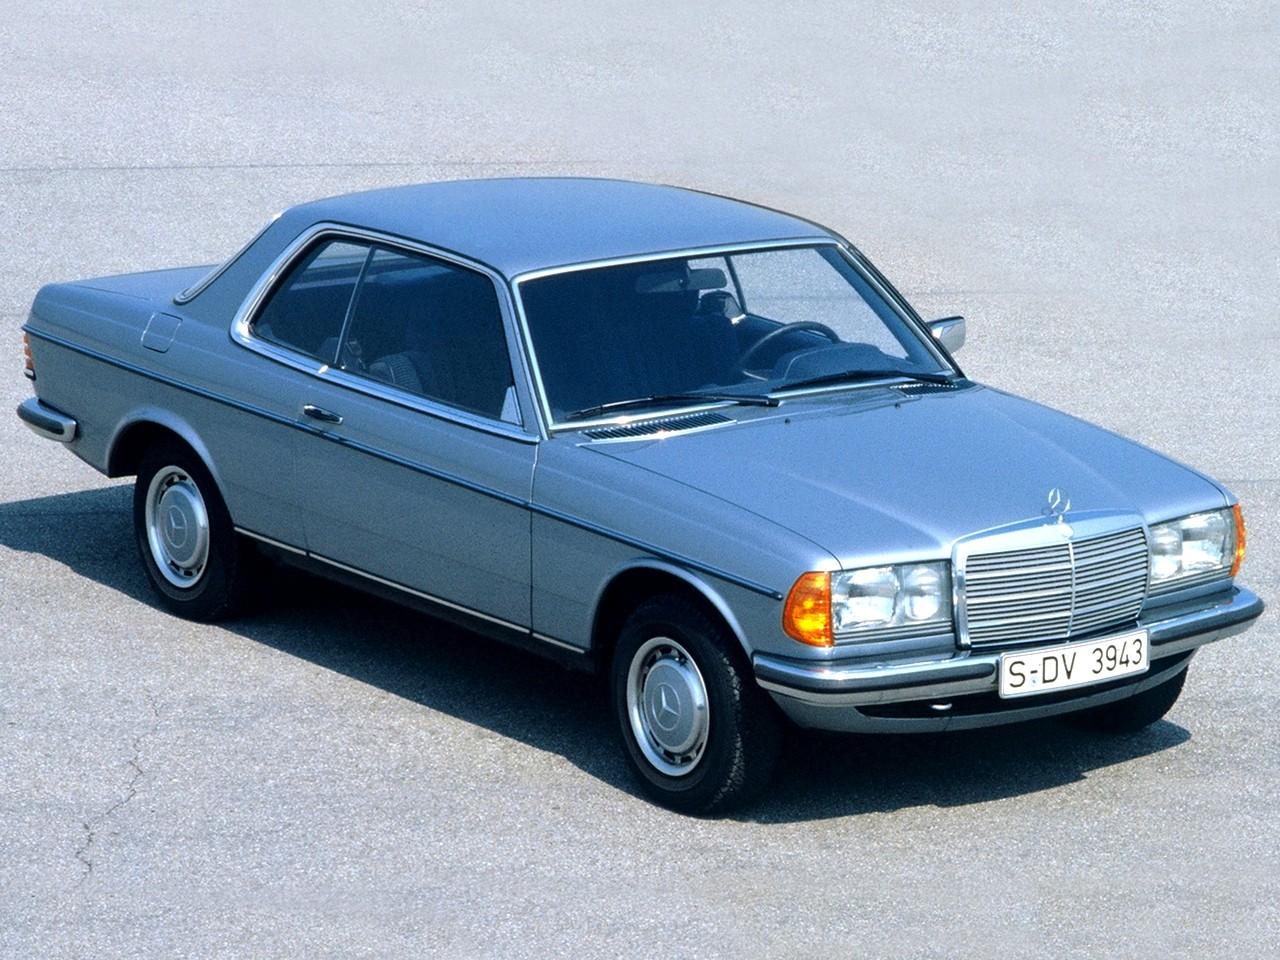 Mercedes Benz Dealers >> MERCEDES BENZ Coupe (C123) specs & photos - 1977, 1978, 1979, 1980, 1981, 1982, 1983, 1984, 1985 ...